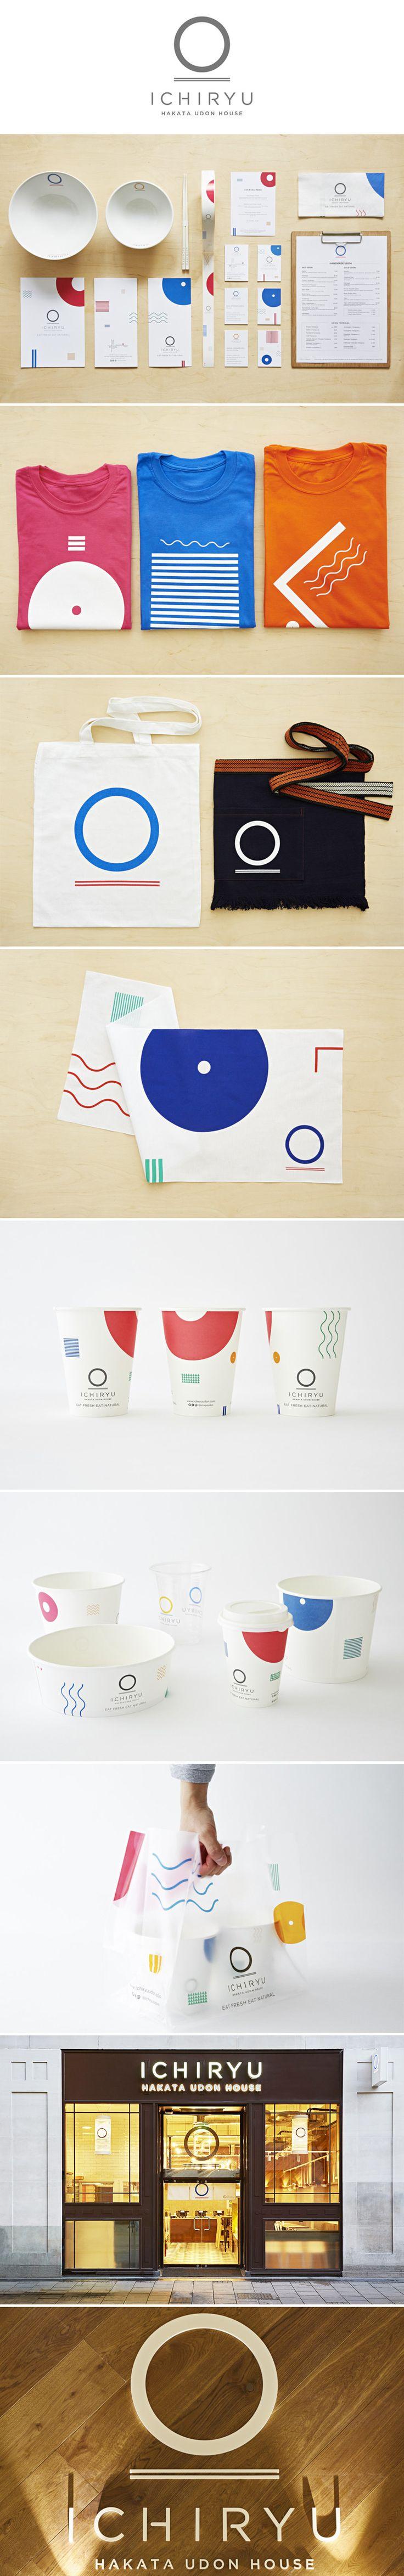 ichiryu udon #branding #logo #design #menu #uniform#tenugui #card #takeaway #cup #packaging #bag #interior#signage